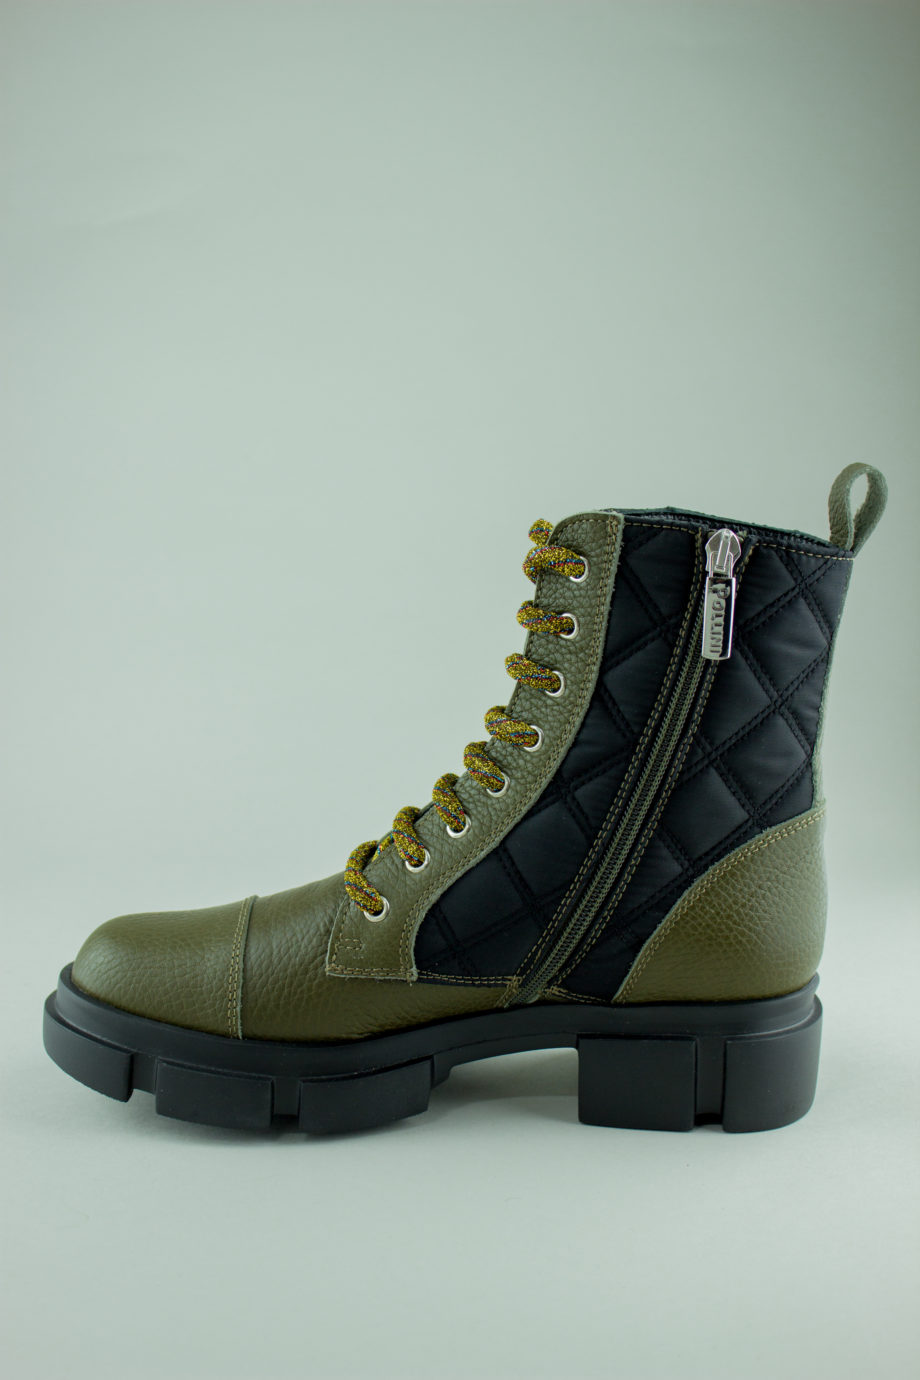 POLLINI military boots